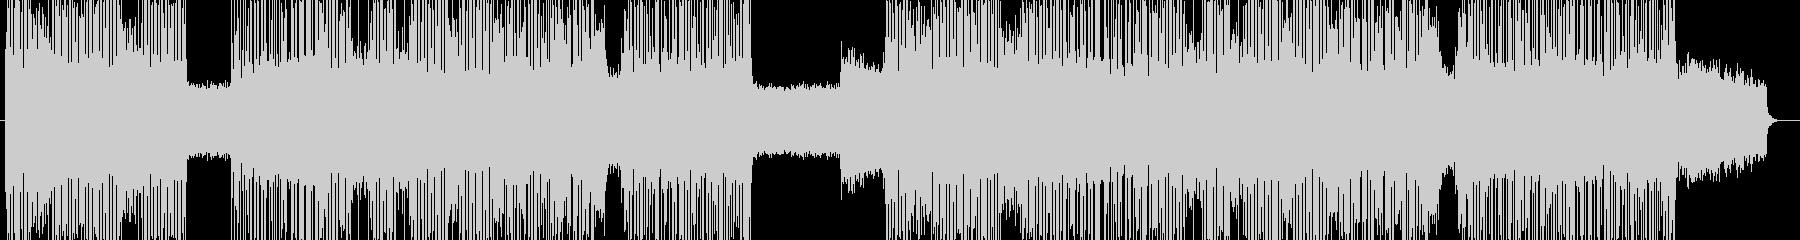 METAL・DARK/DEATH 284の未再生の波形